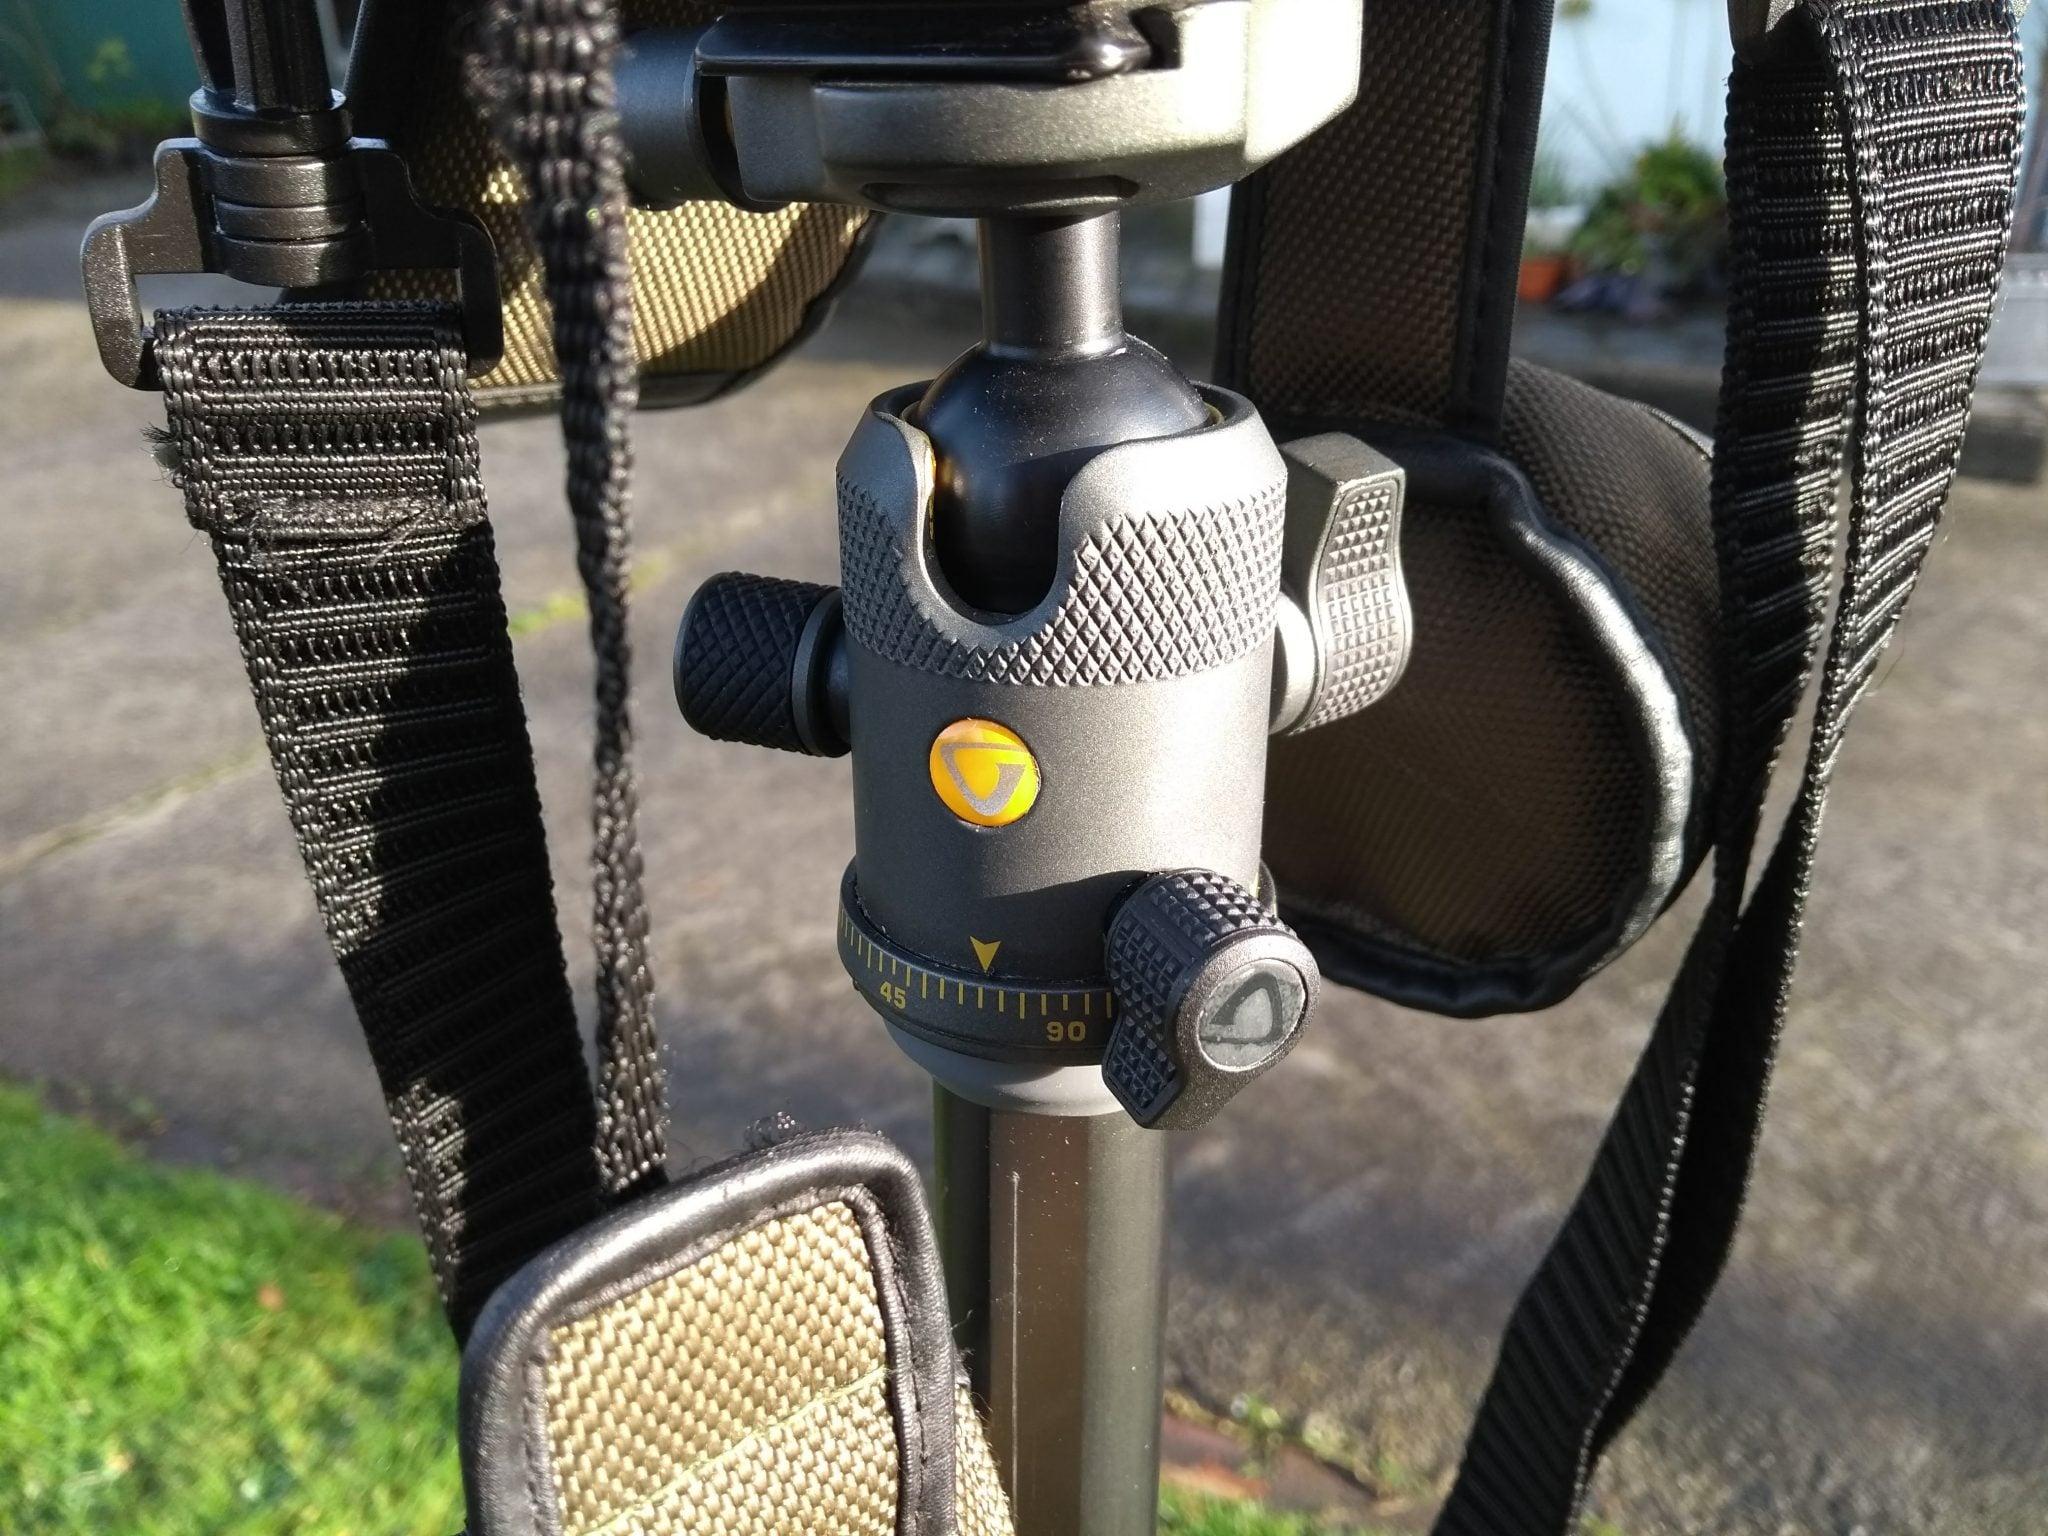 Vanguard Veo2 265cb Travel Tripod Irelands Wildlife Veo Carbon Fiber The Versatile Bh 50 Ball Head Comes Bundled With